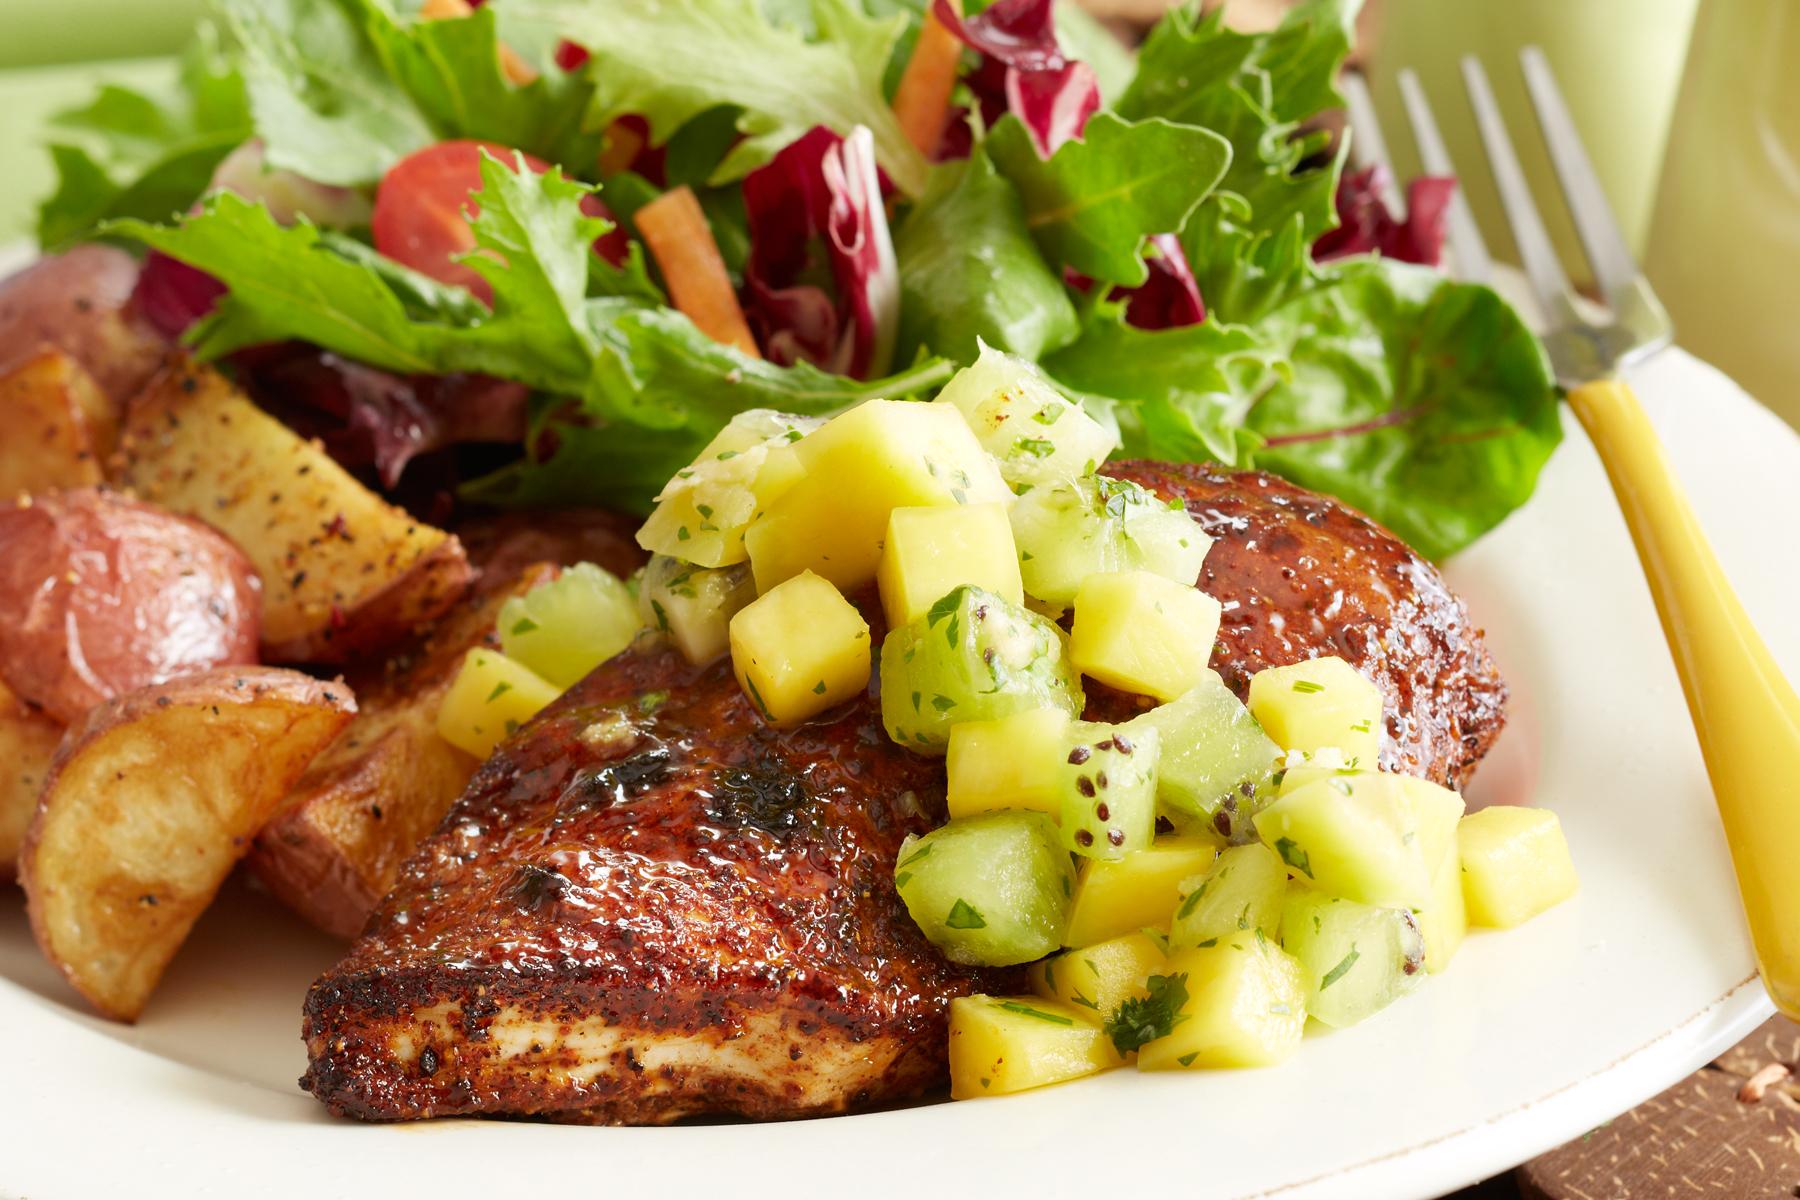 Caribbean Chicken with Mango-Kiwi Salsa | Recipes & Meals - Stop&Shop